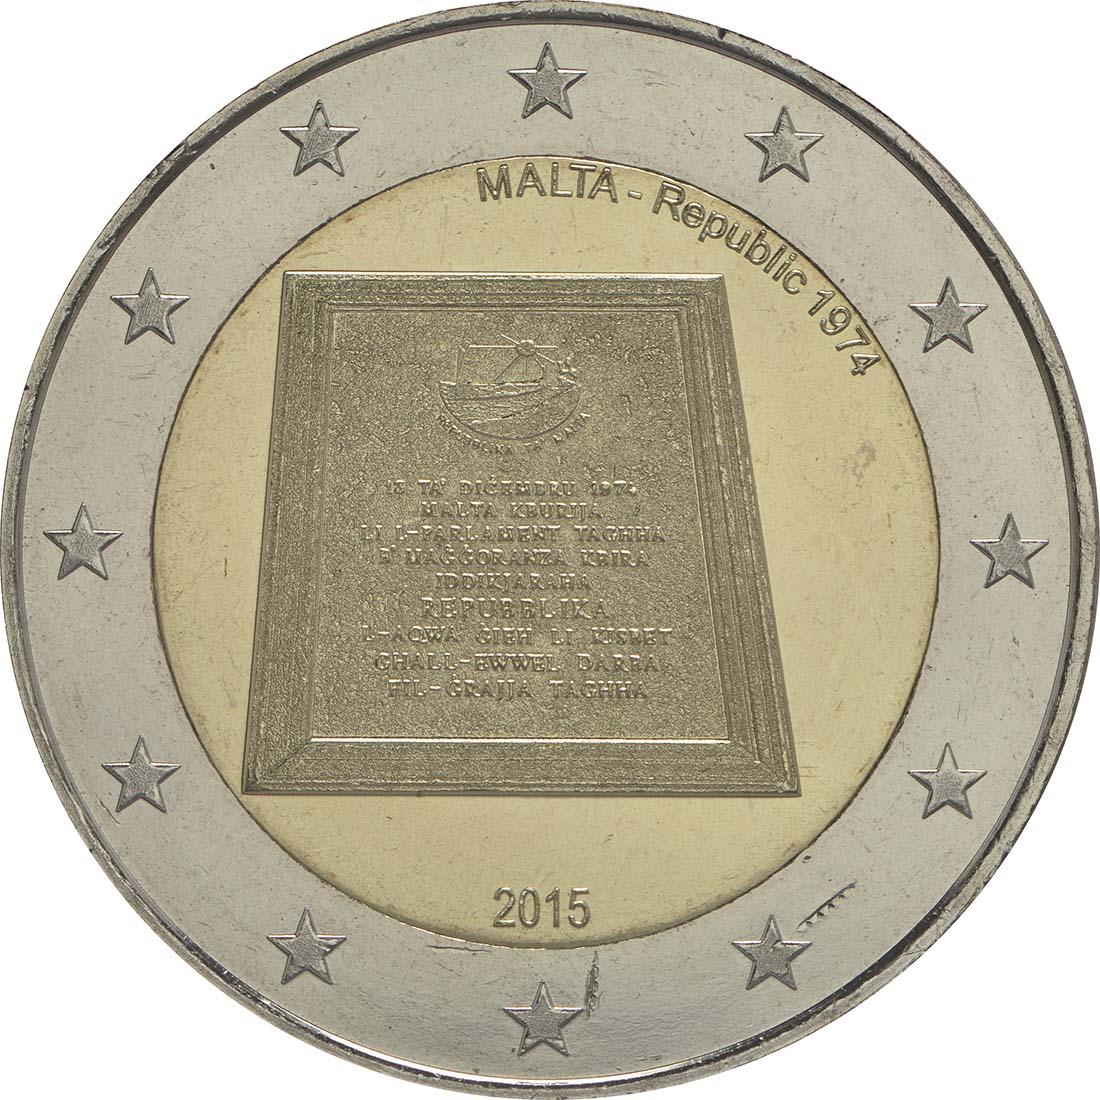 2015 196 Malta Republik 1974.jpg